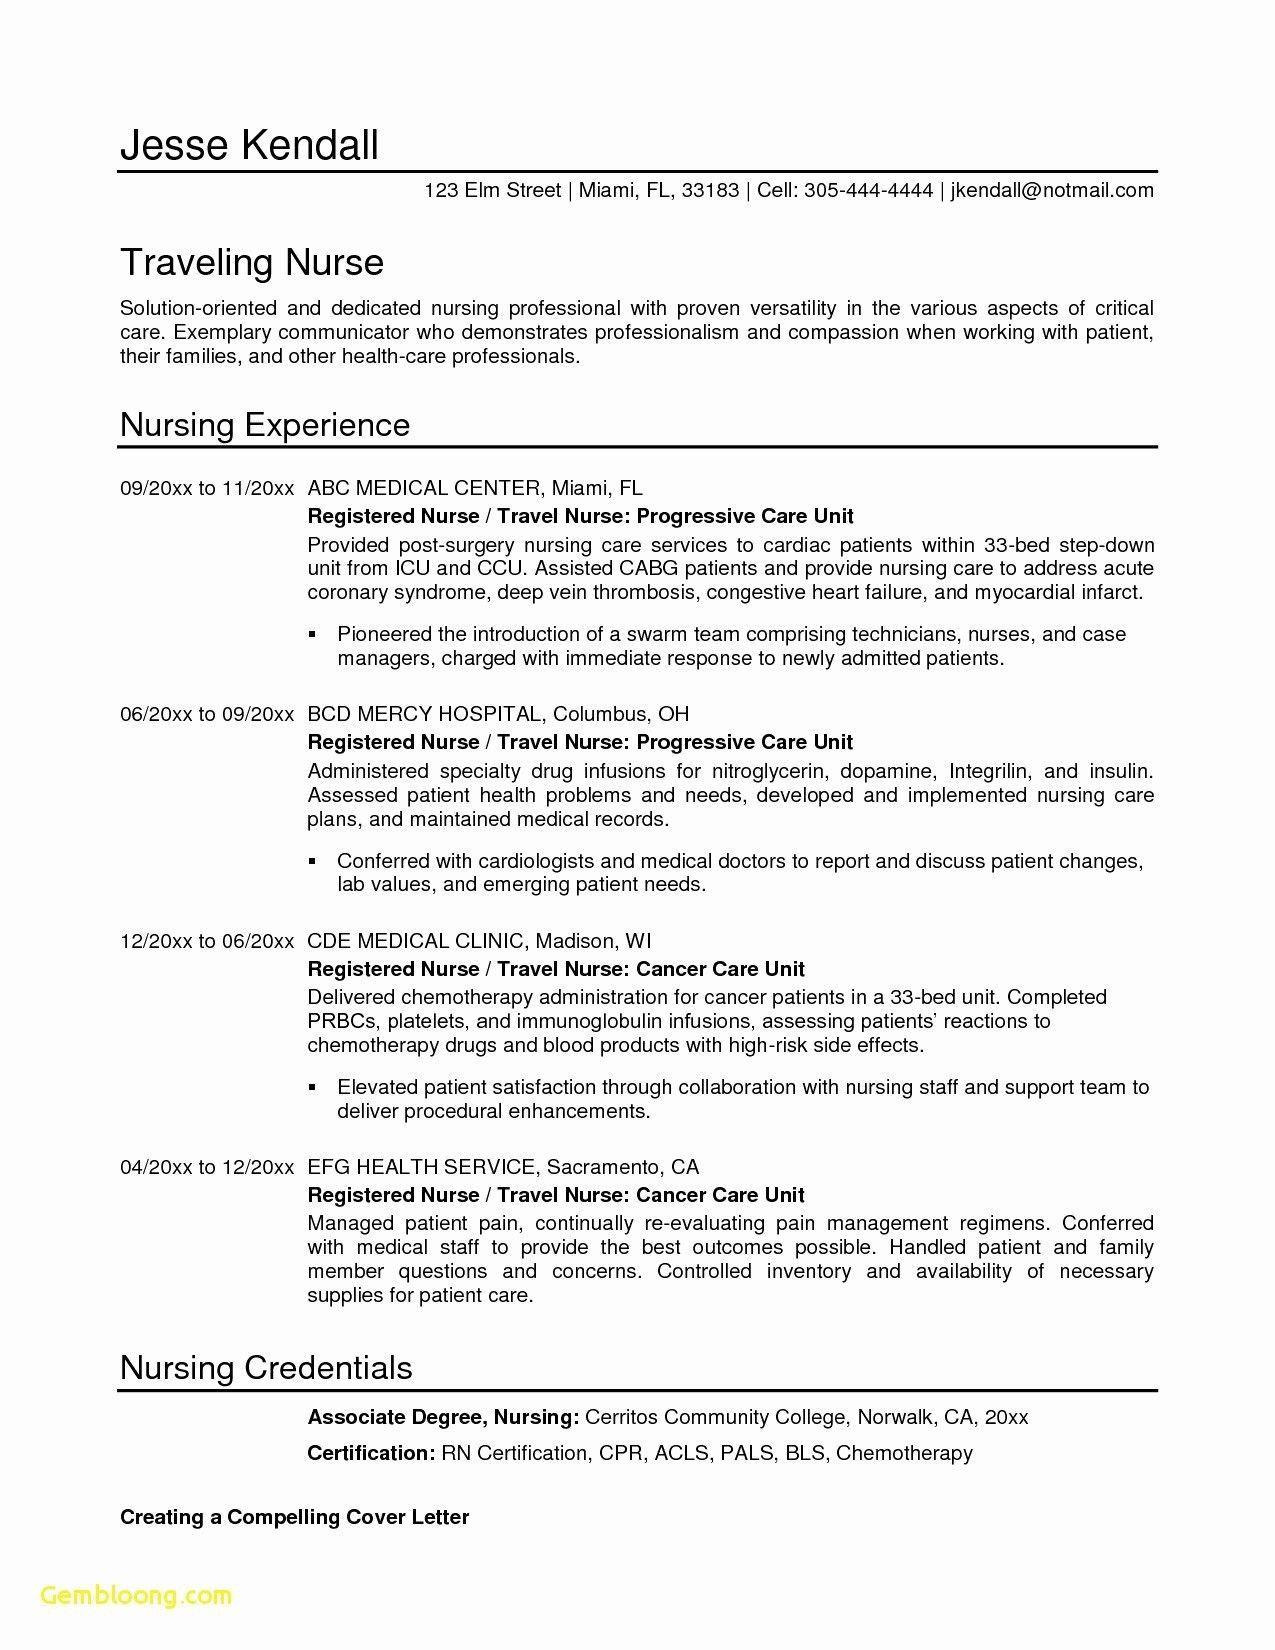 Dui Report Template Legal Nurse Consultant Resume Objective Examples Nursing Resume Legal nurse consultant report template